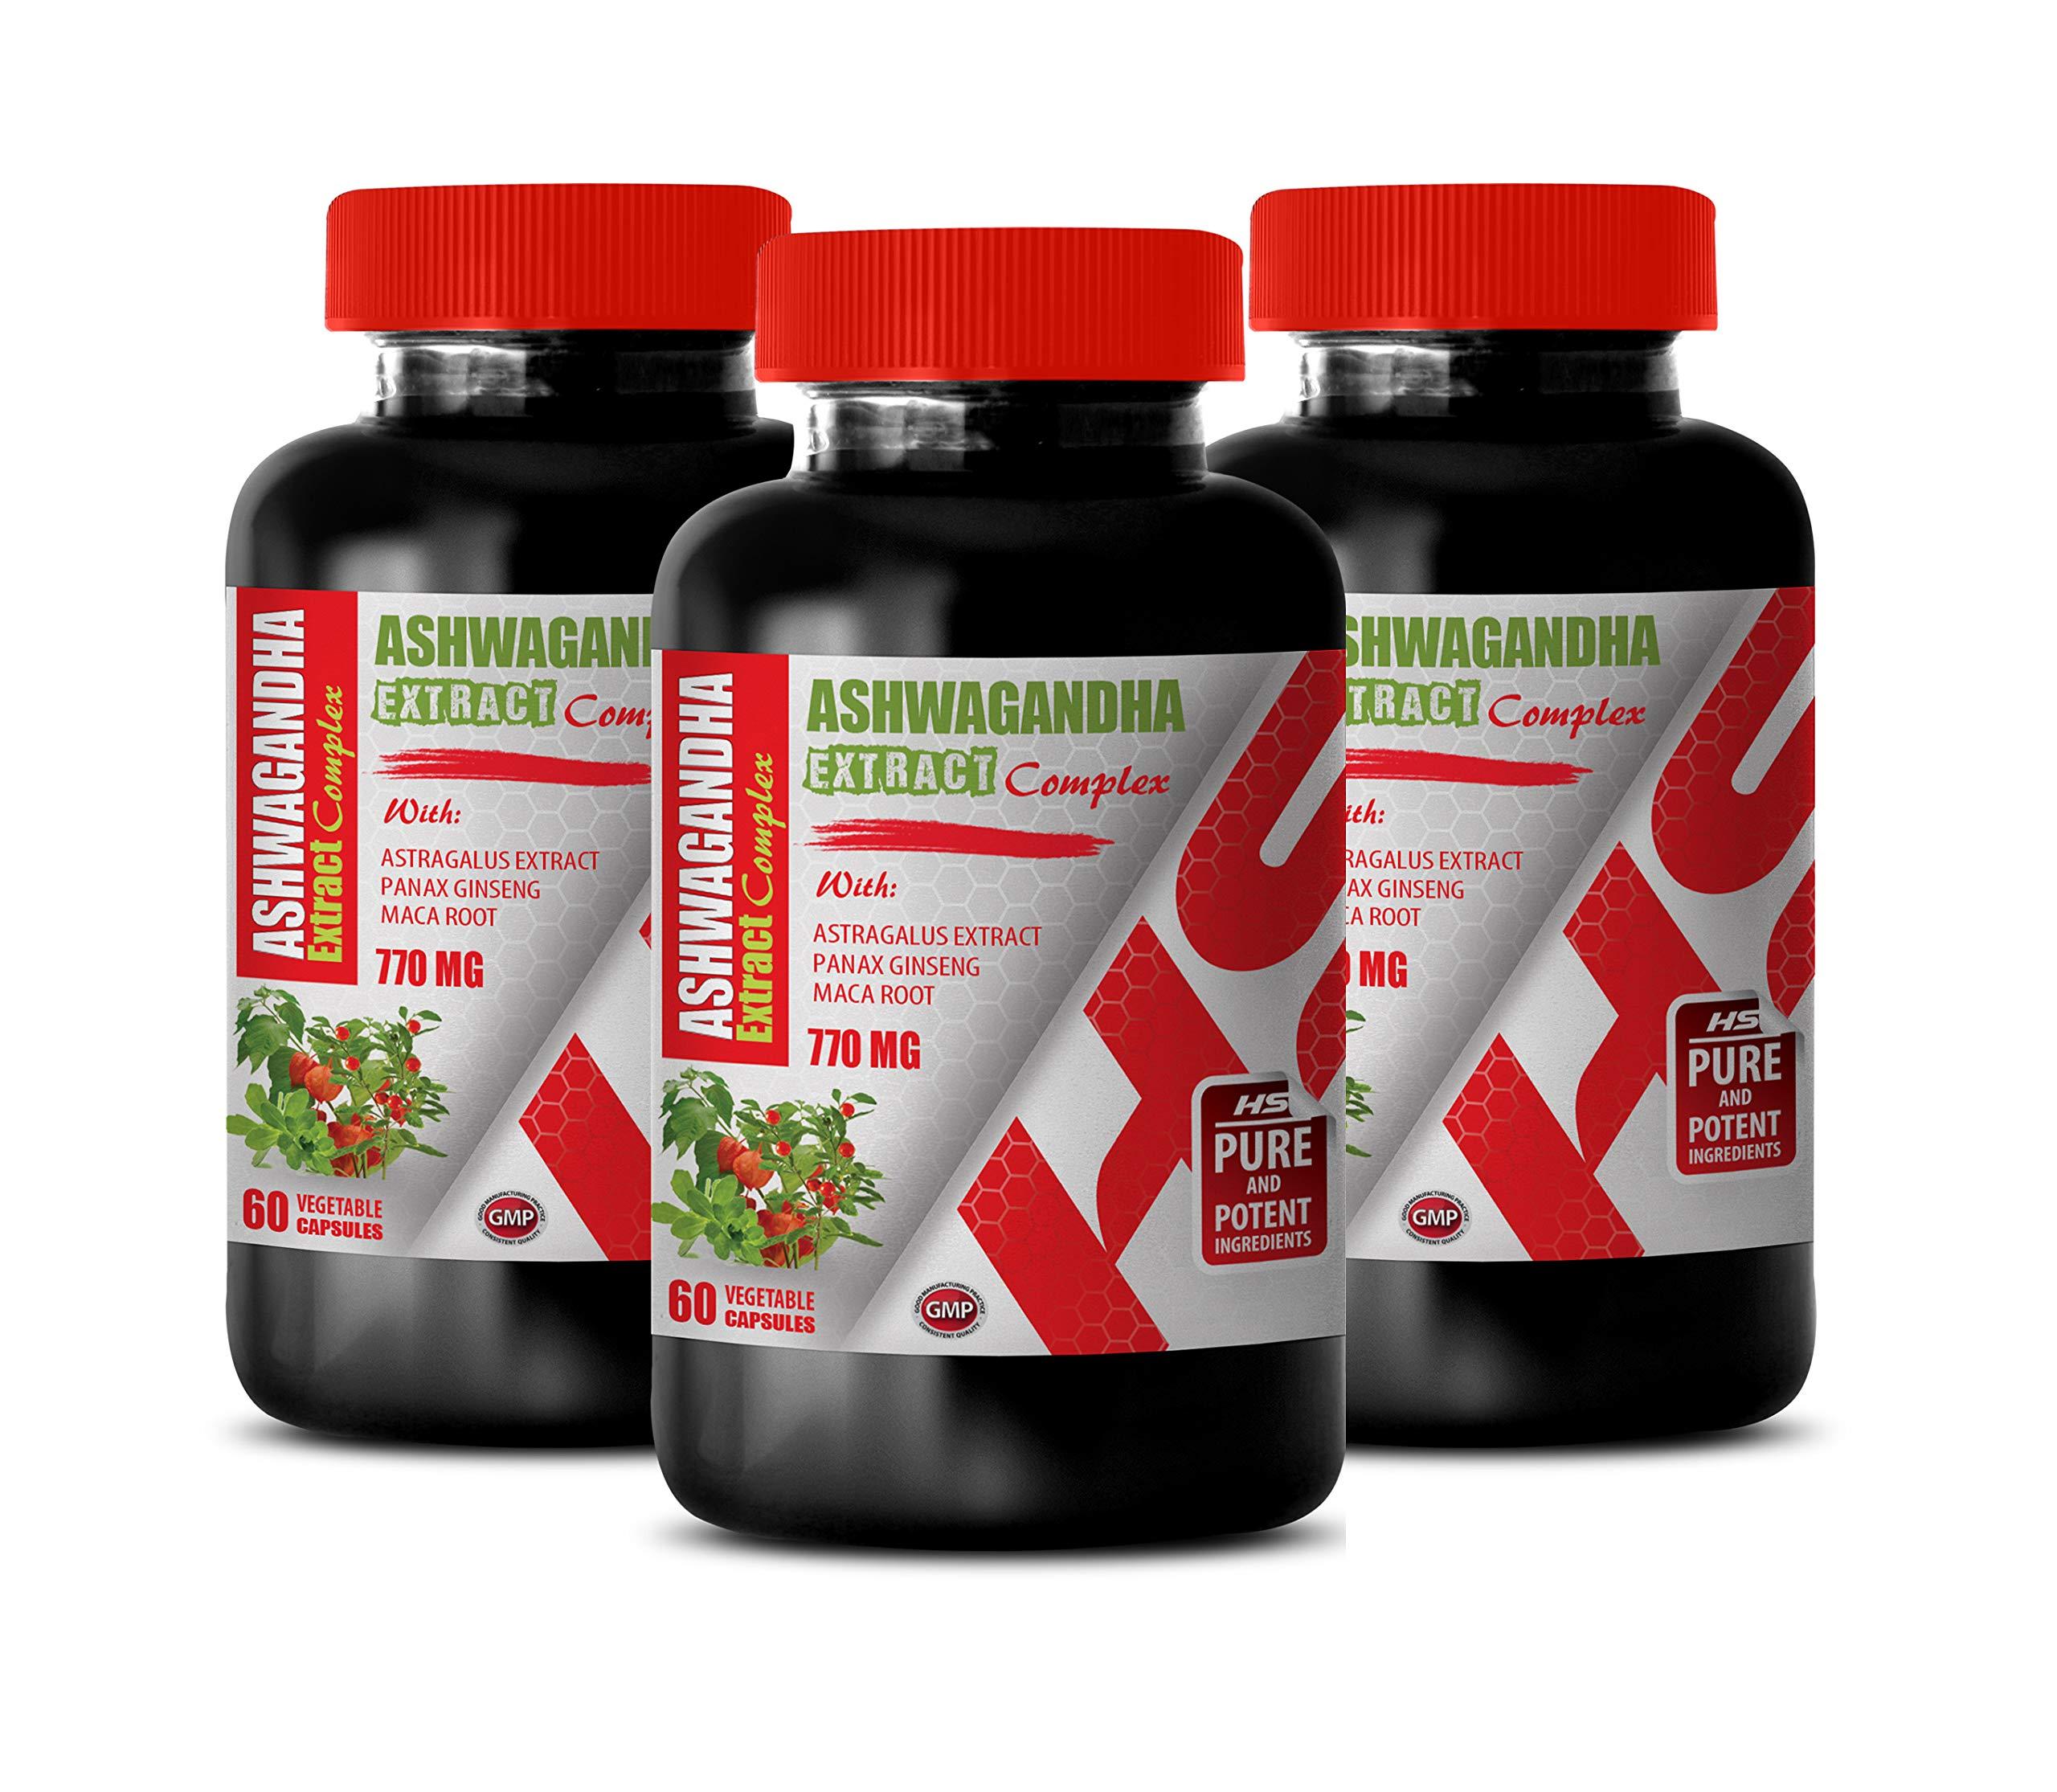 Memory Supplement for Brain - ASHWAGANDHA Extract 770MG Complex - ashwagandha multivitamin - 3 Bottles 180 Capsules